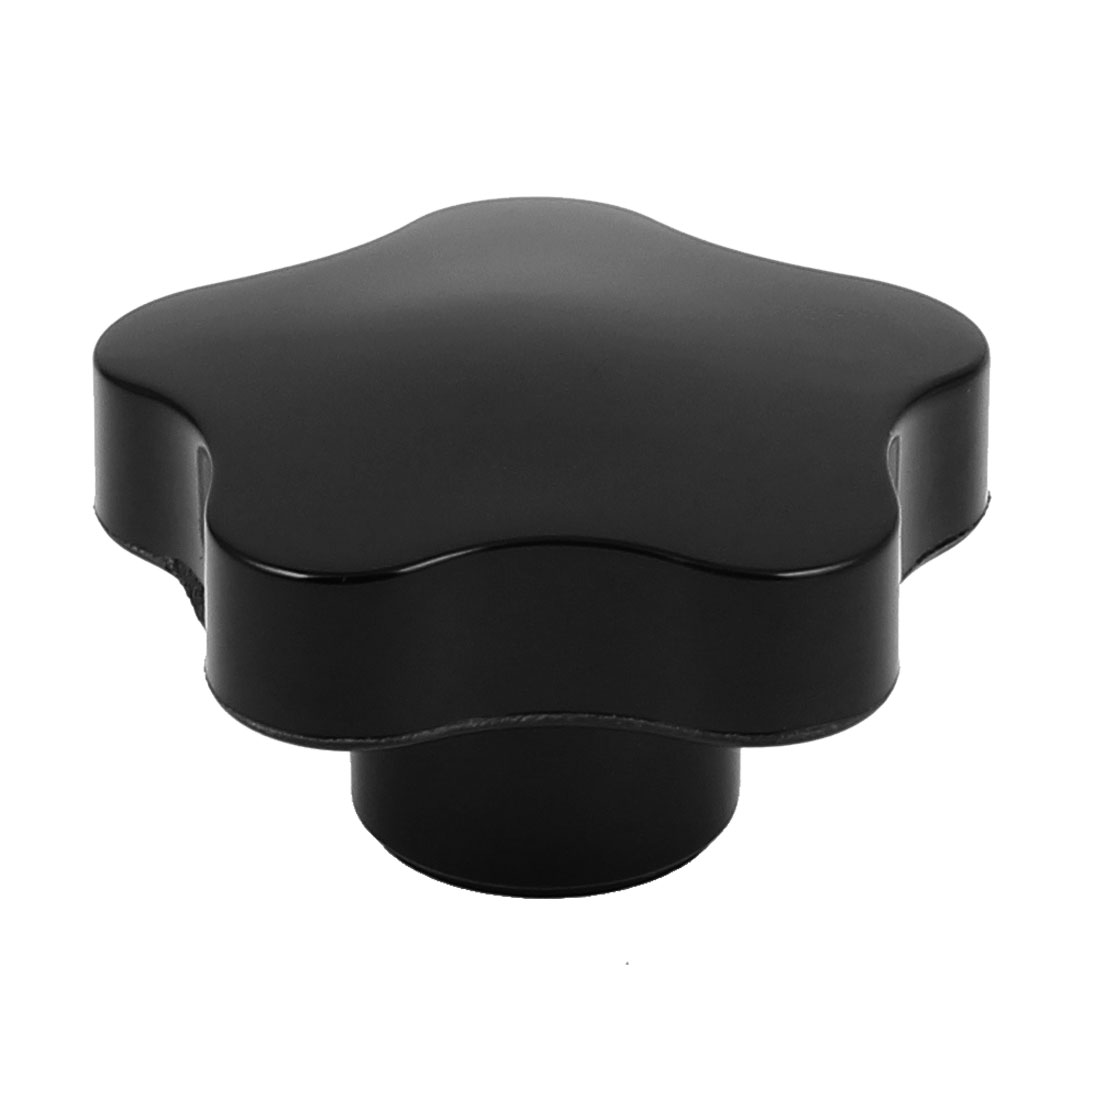 M16 Female Threaded Plastic Star Design Head Clamping Screw Nuts Knob Handle Handgrip